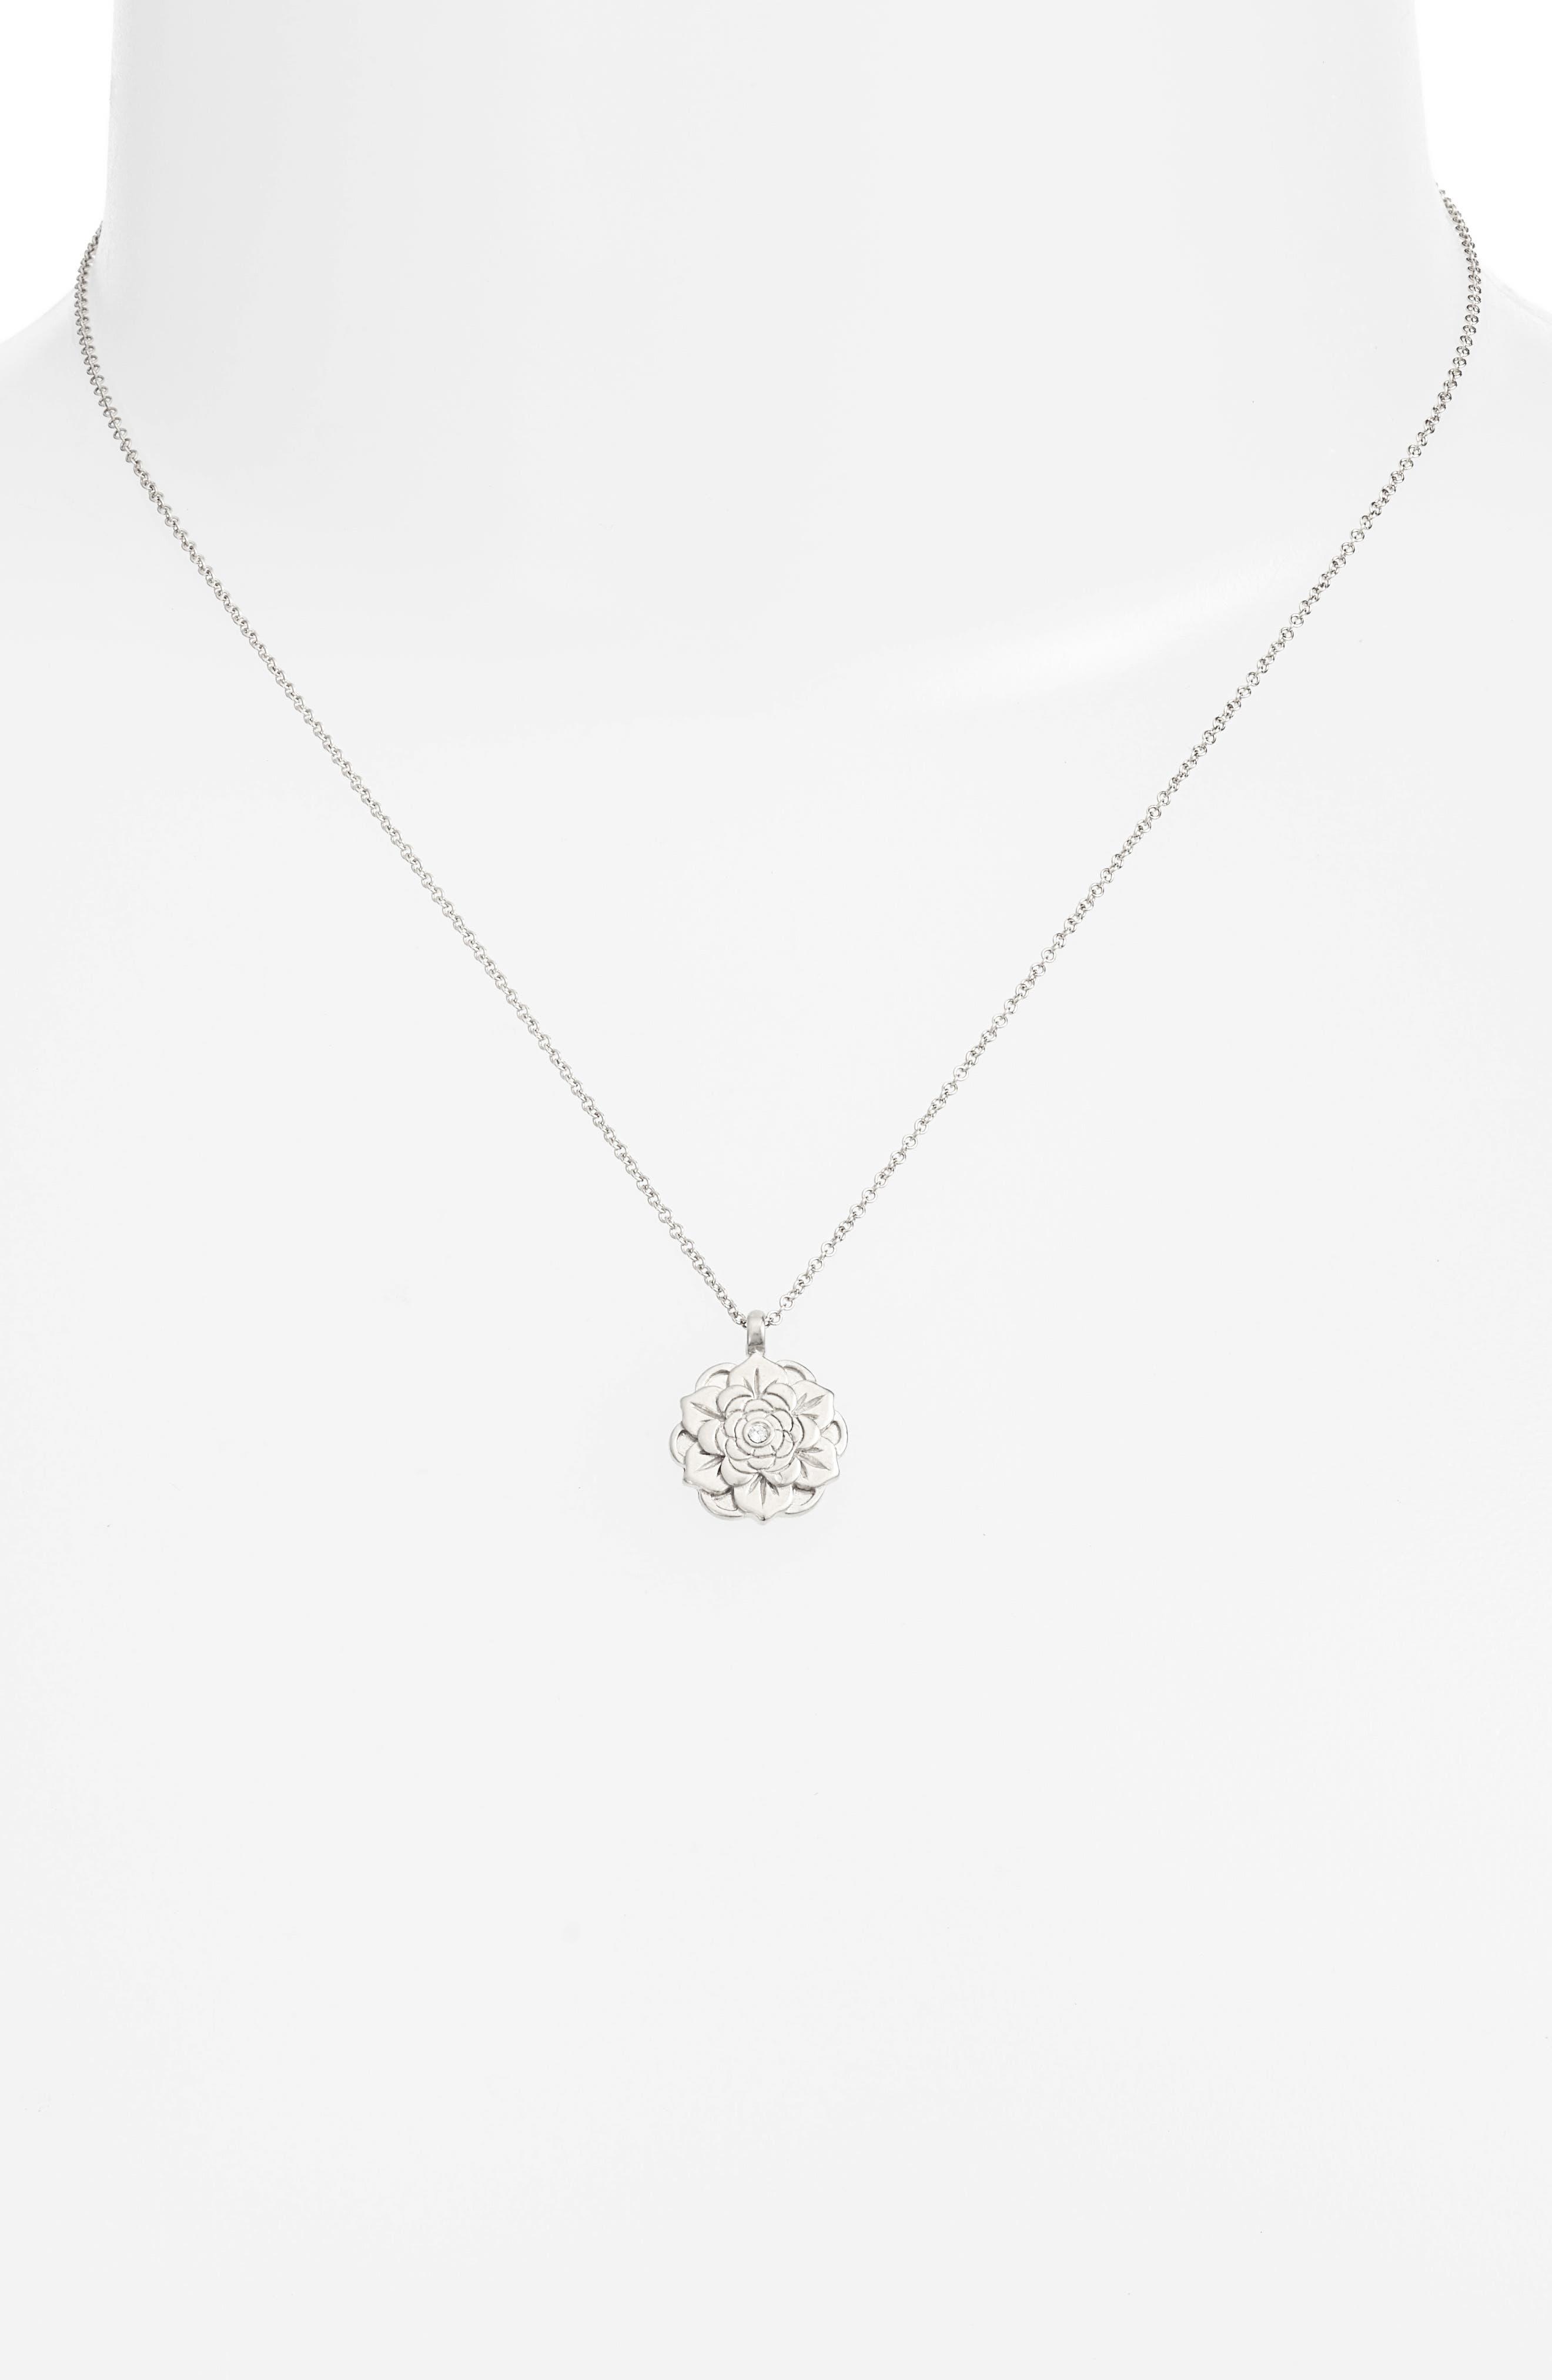 Beautiful Beginnings Lotus Pendant Necklace,                             Alternate thumbnail 2, color,                             040